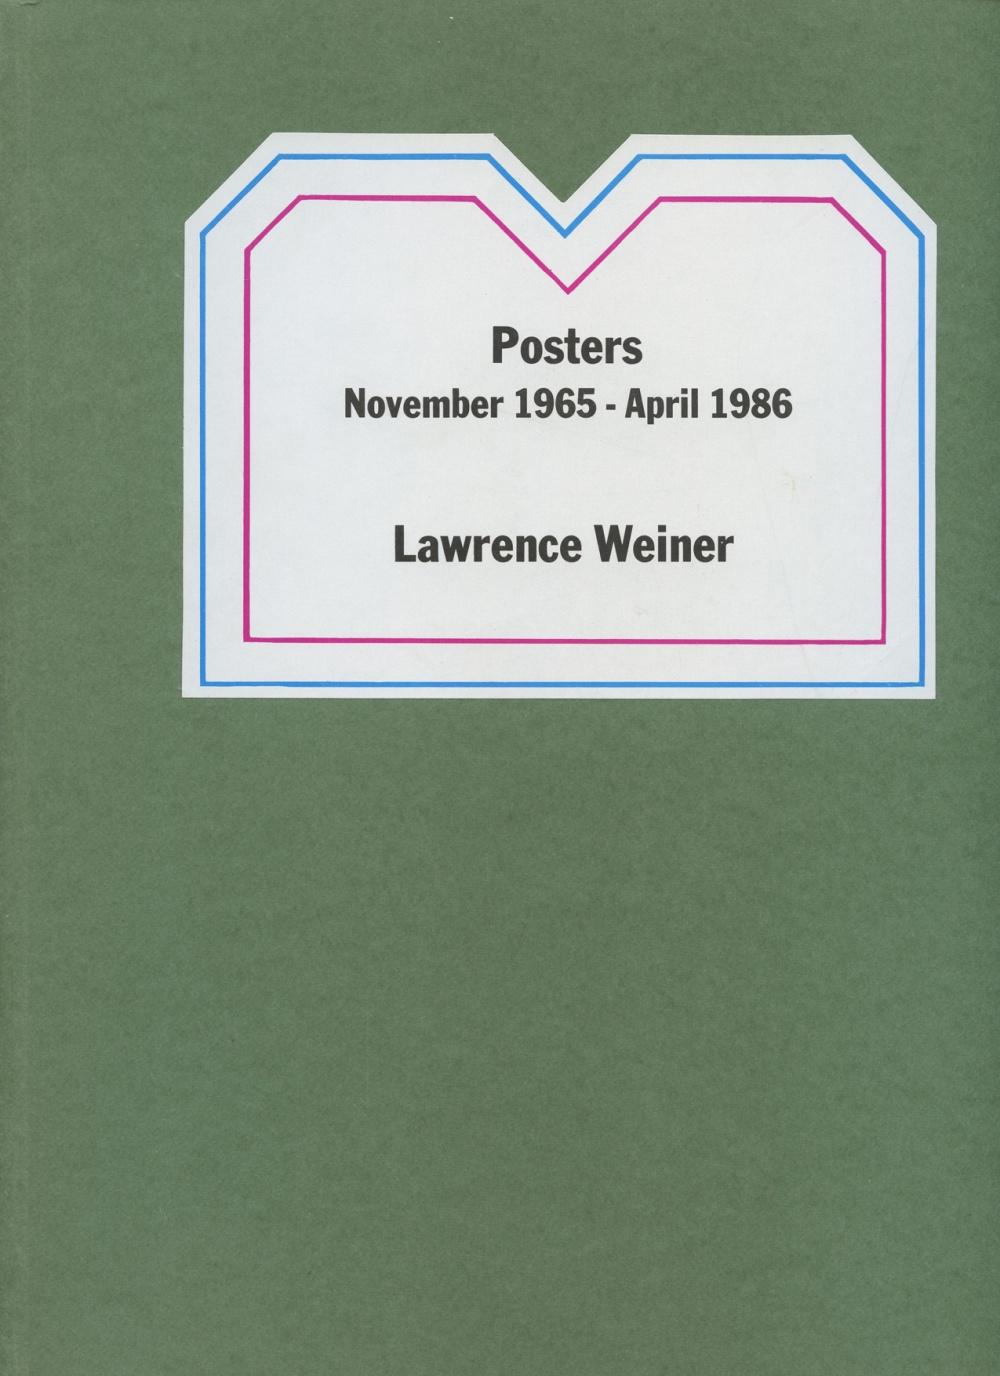 POSTERS: NOVEMBER 1965 - APRIL 1986